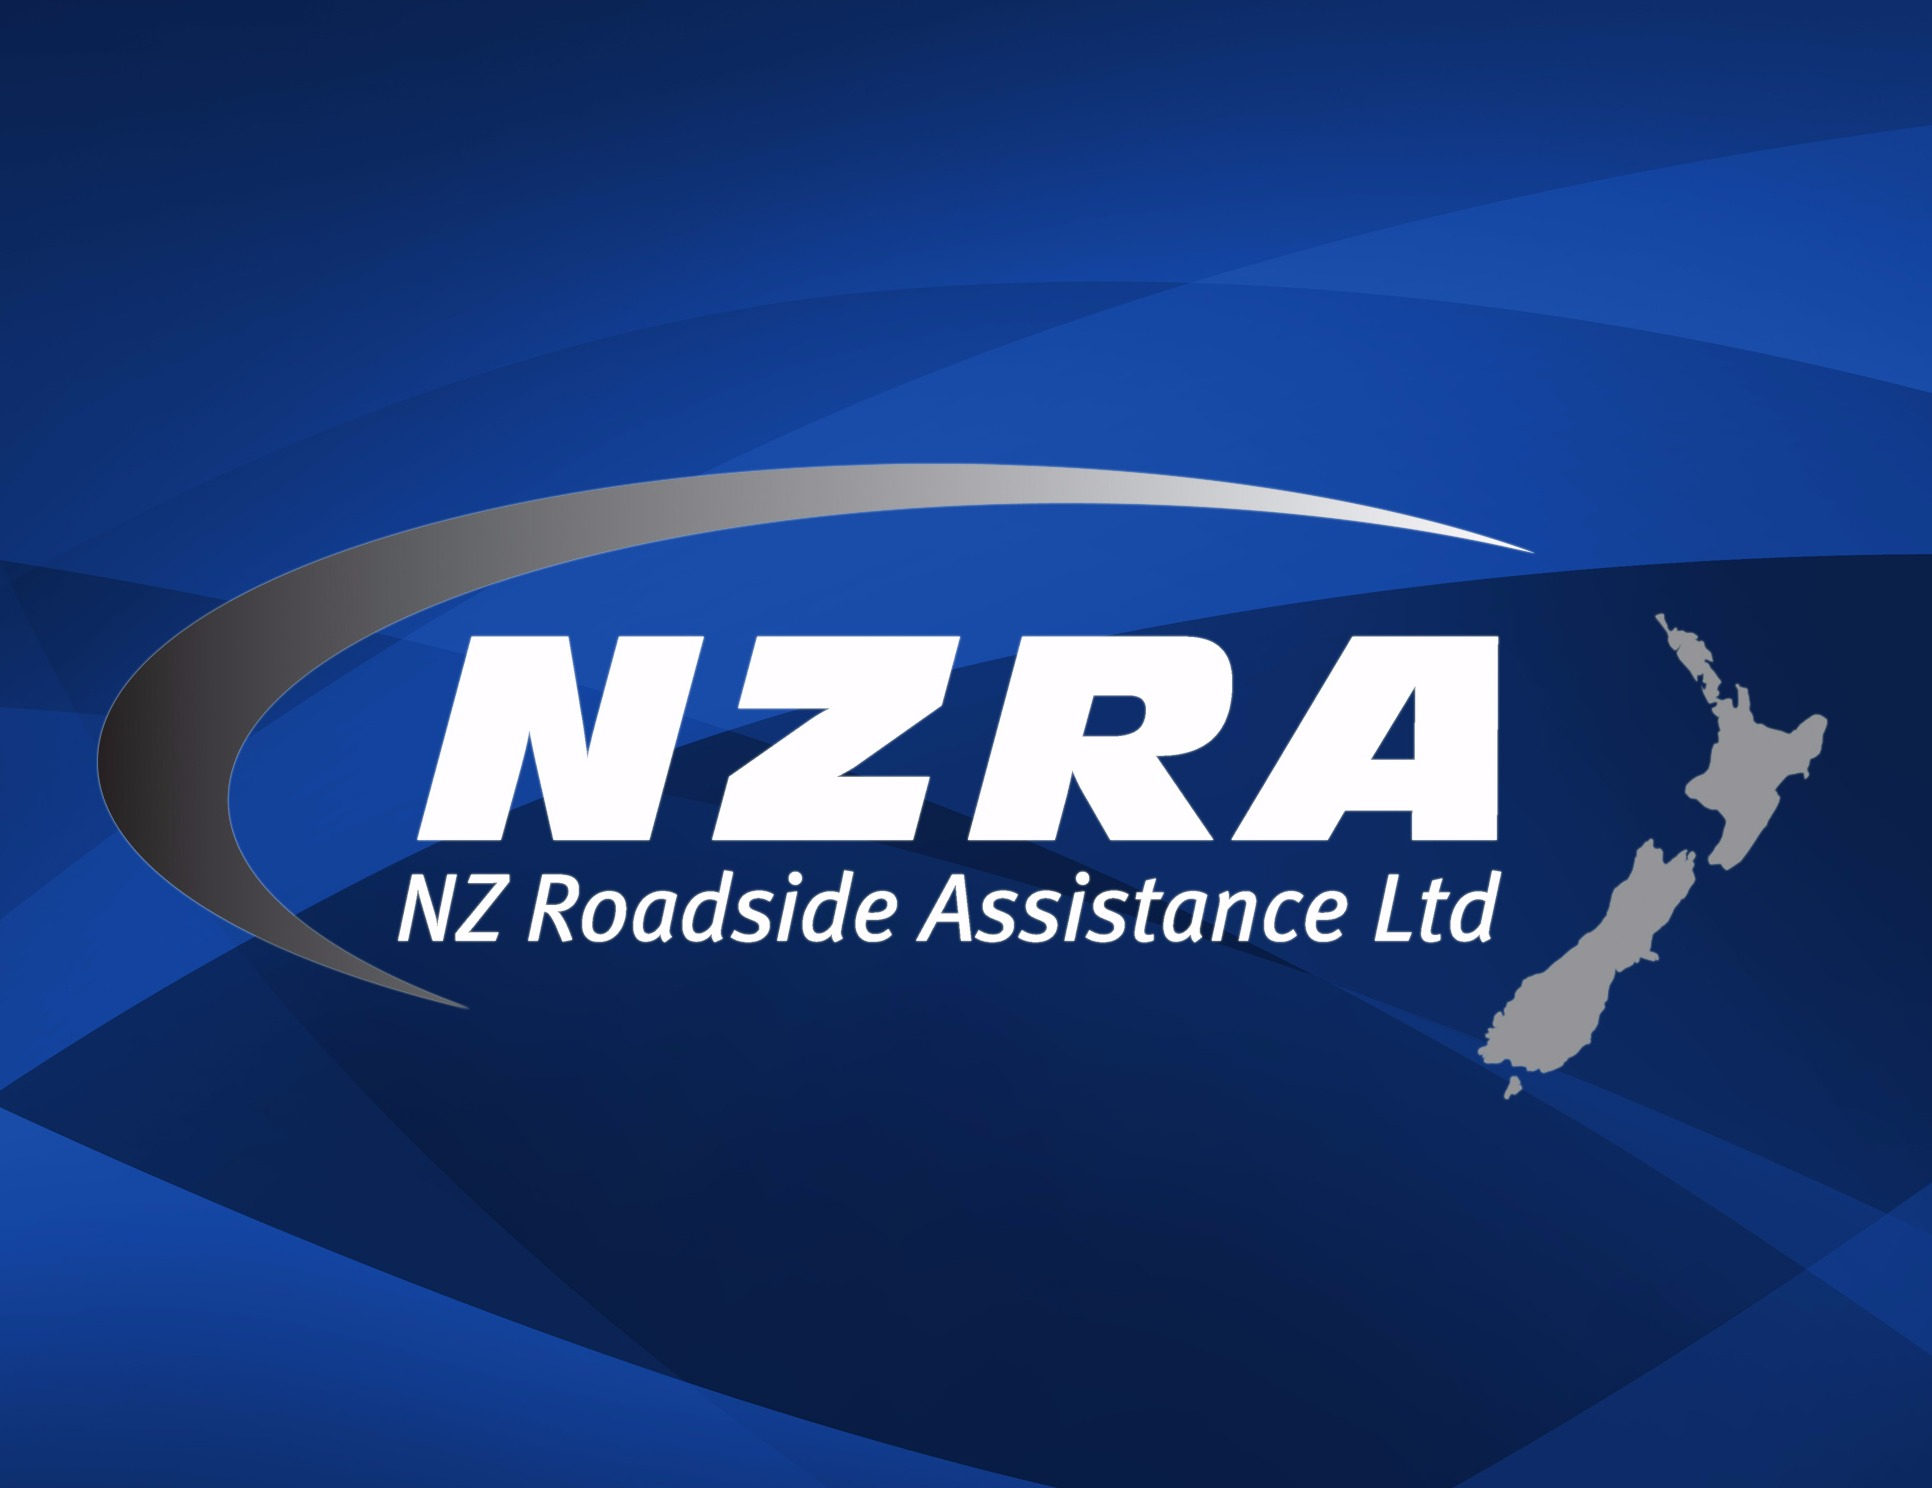 NZ Roadside Assistance Ltd